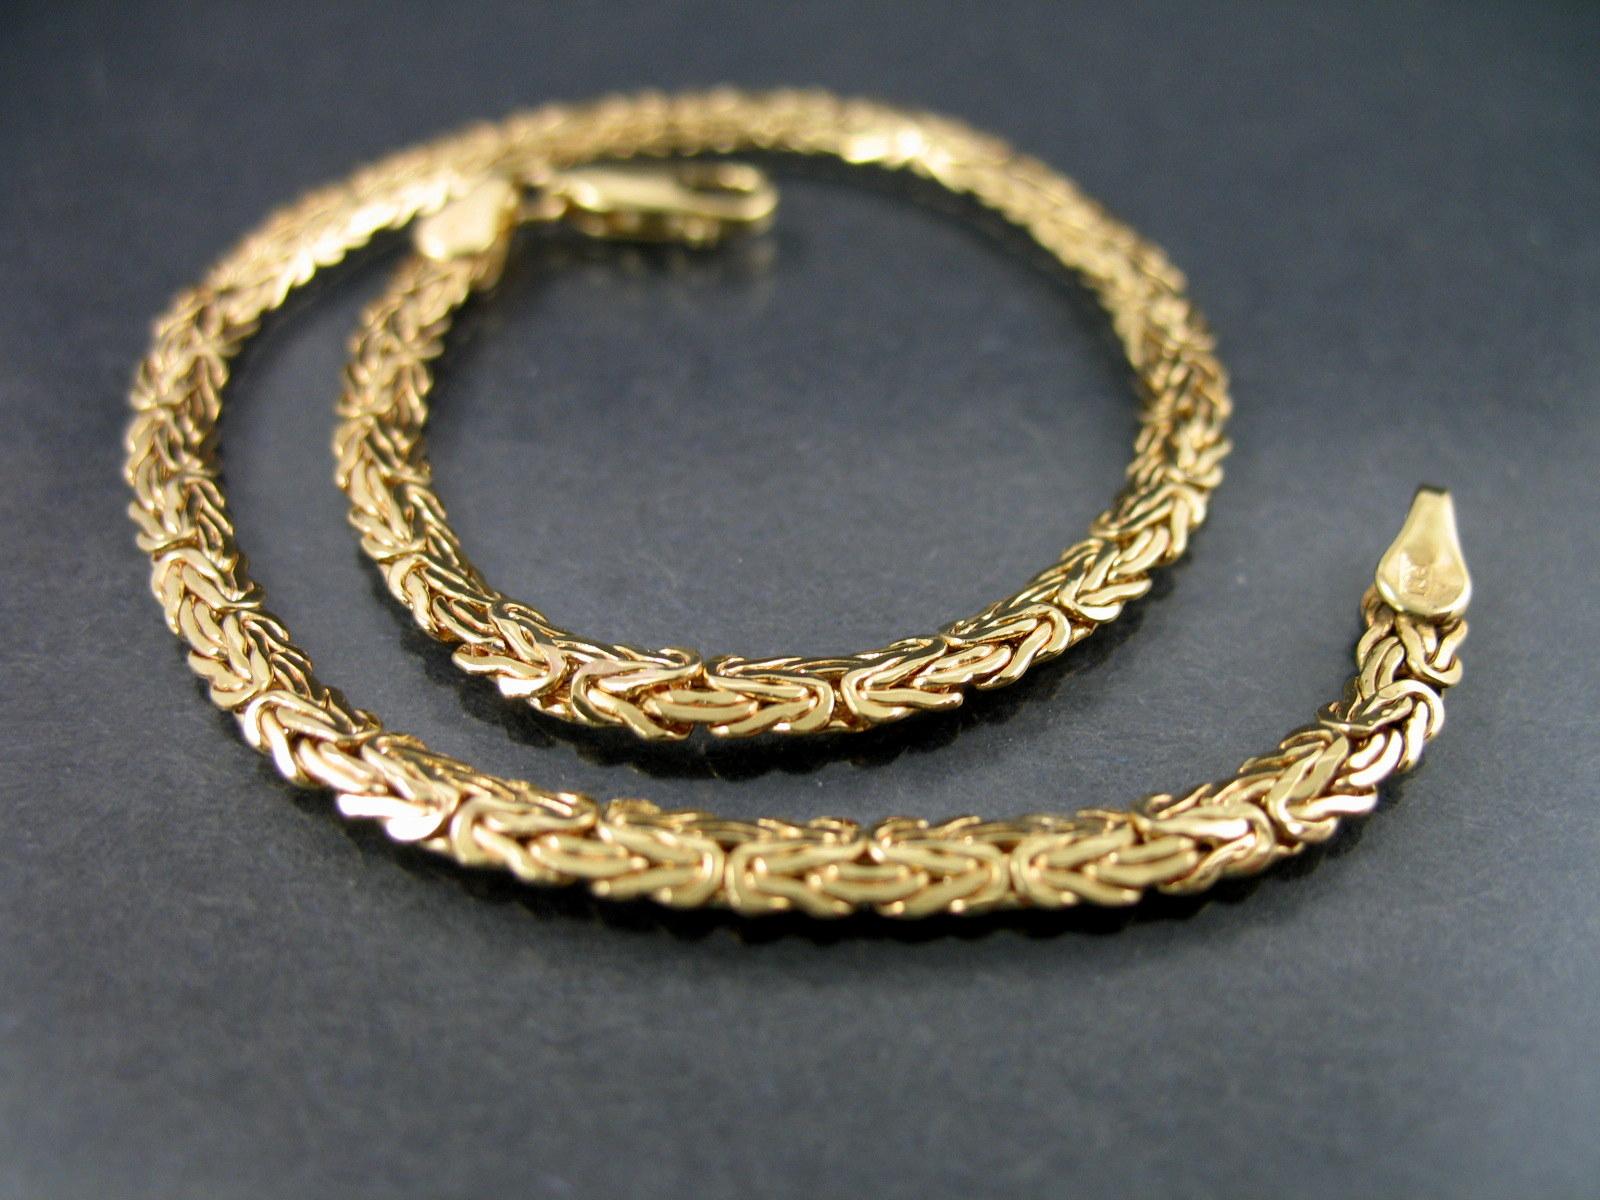 Bracelet Zipper Galleries Byzantine Bracelet Gold